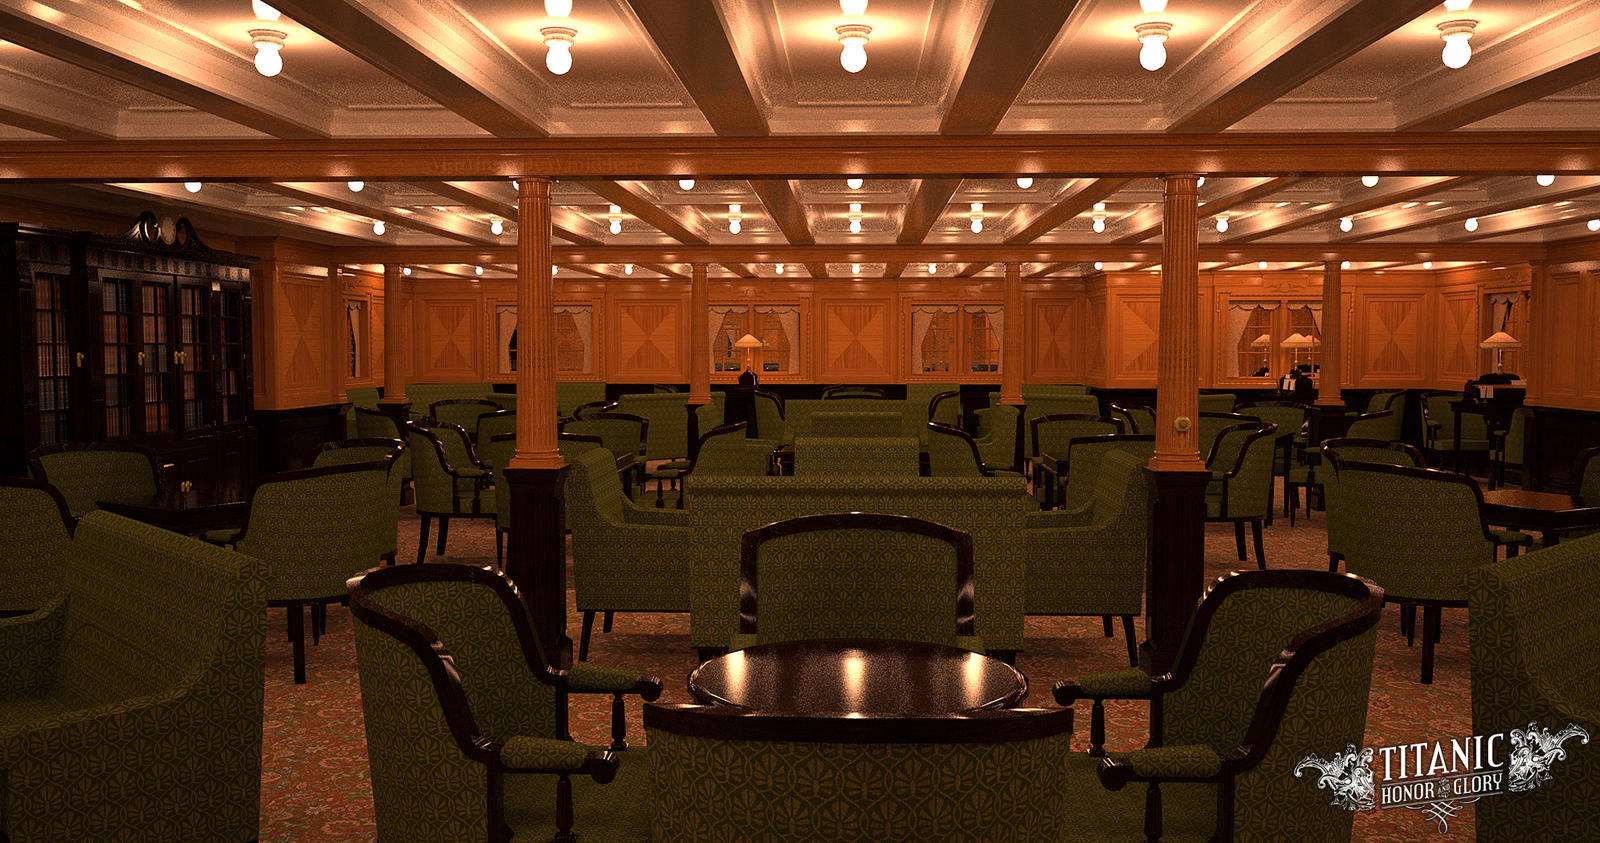 titanics forward second class - photo #33